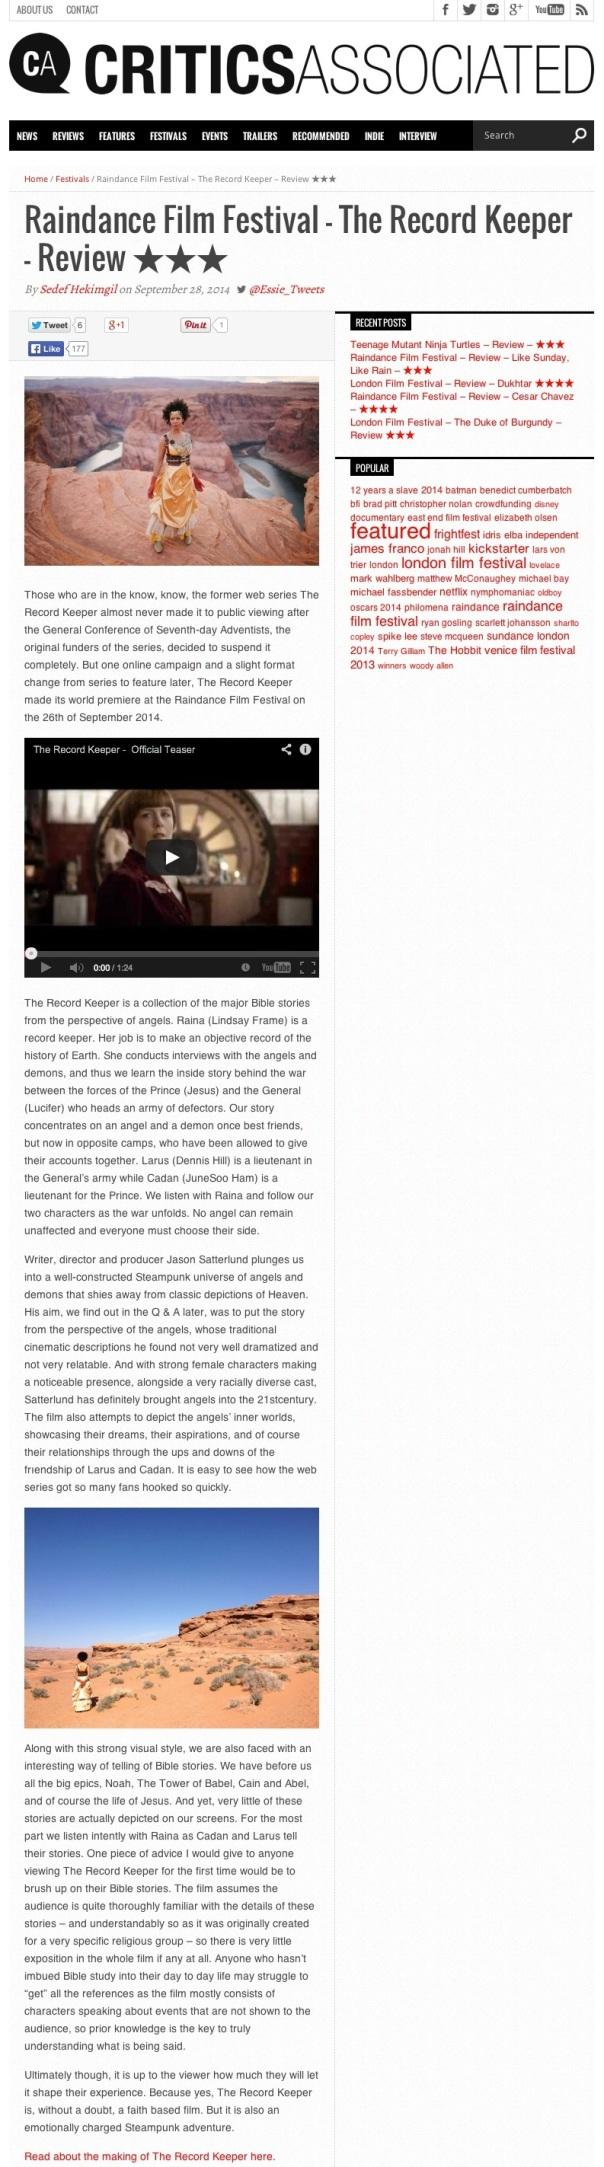 Raindance Film Festival – The Record Keeper – Review ★★★ - Critics Associated